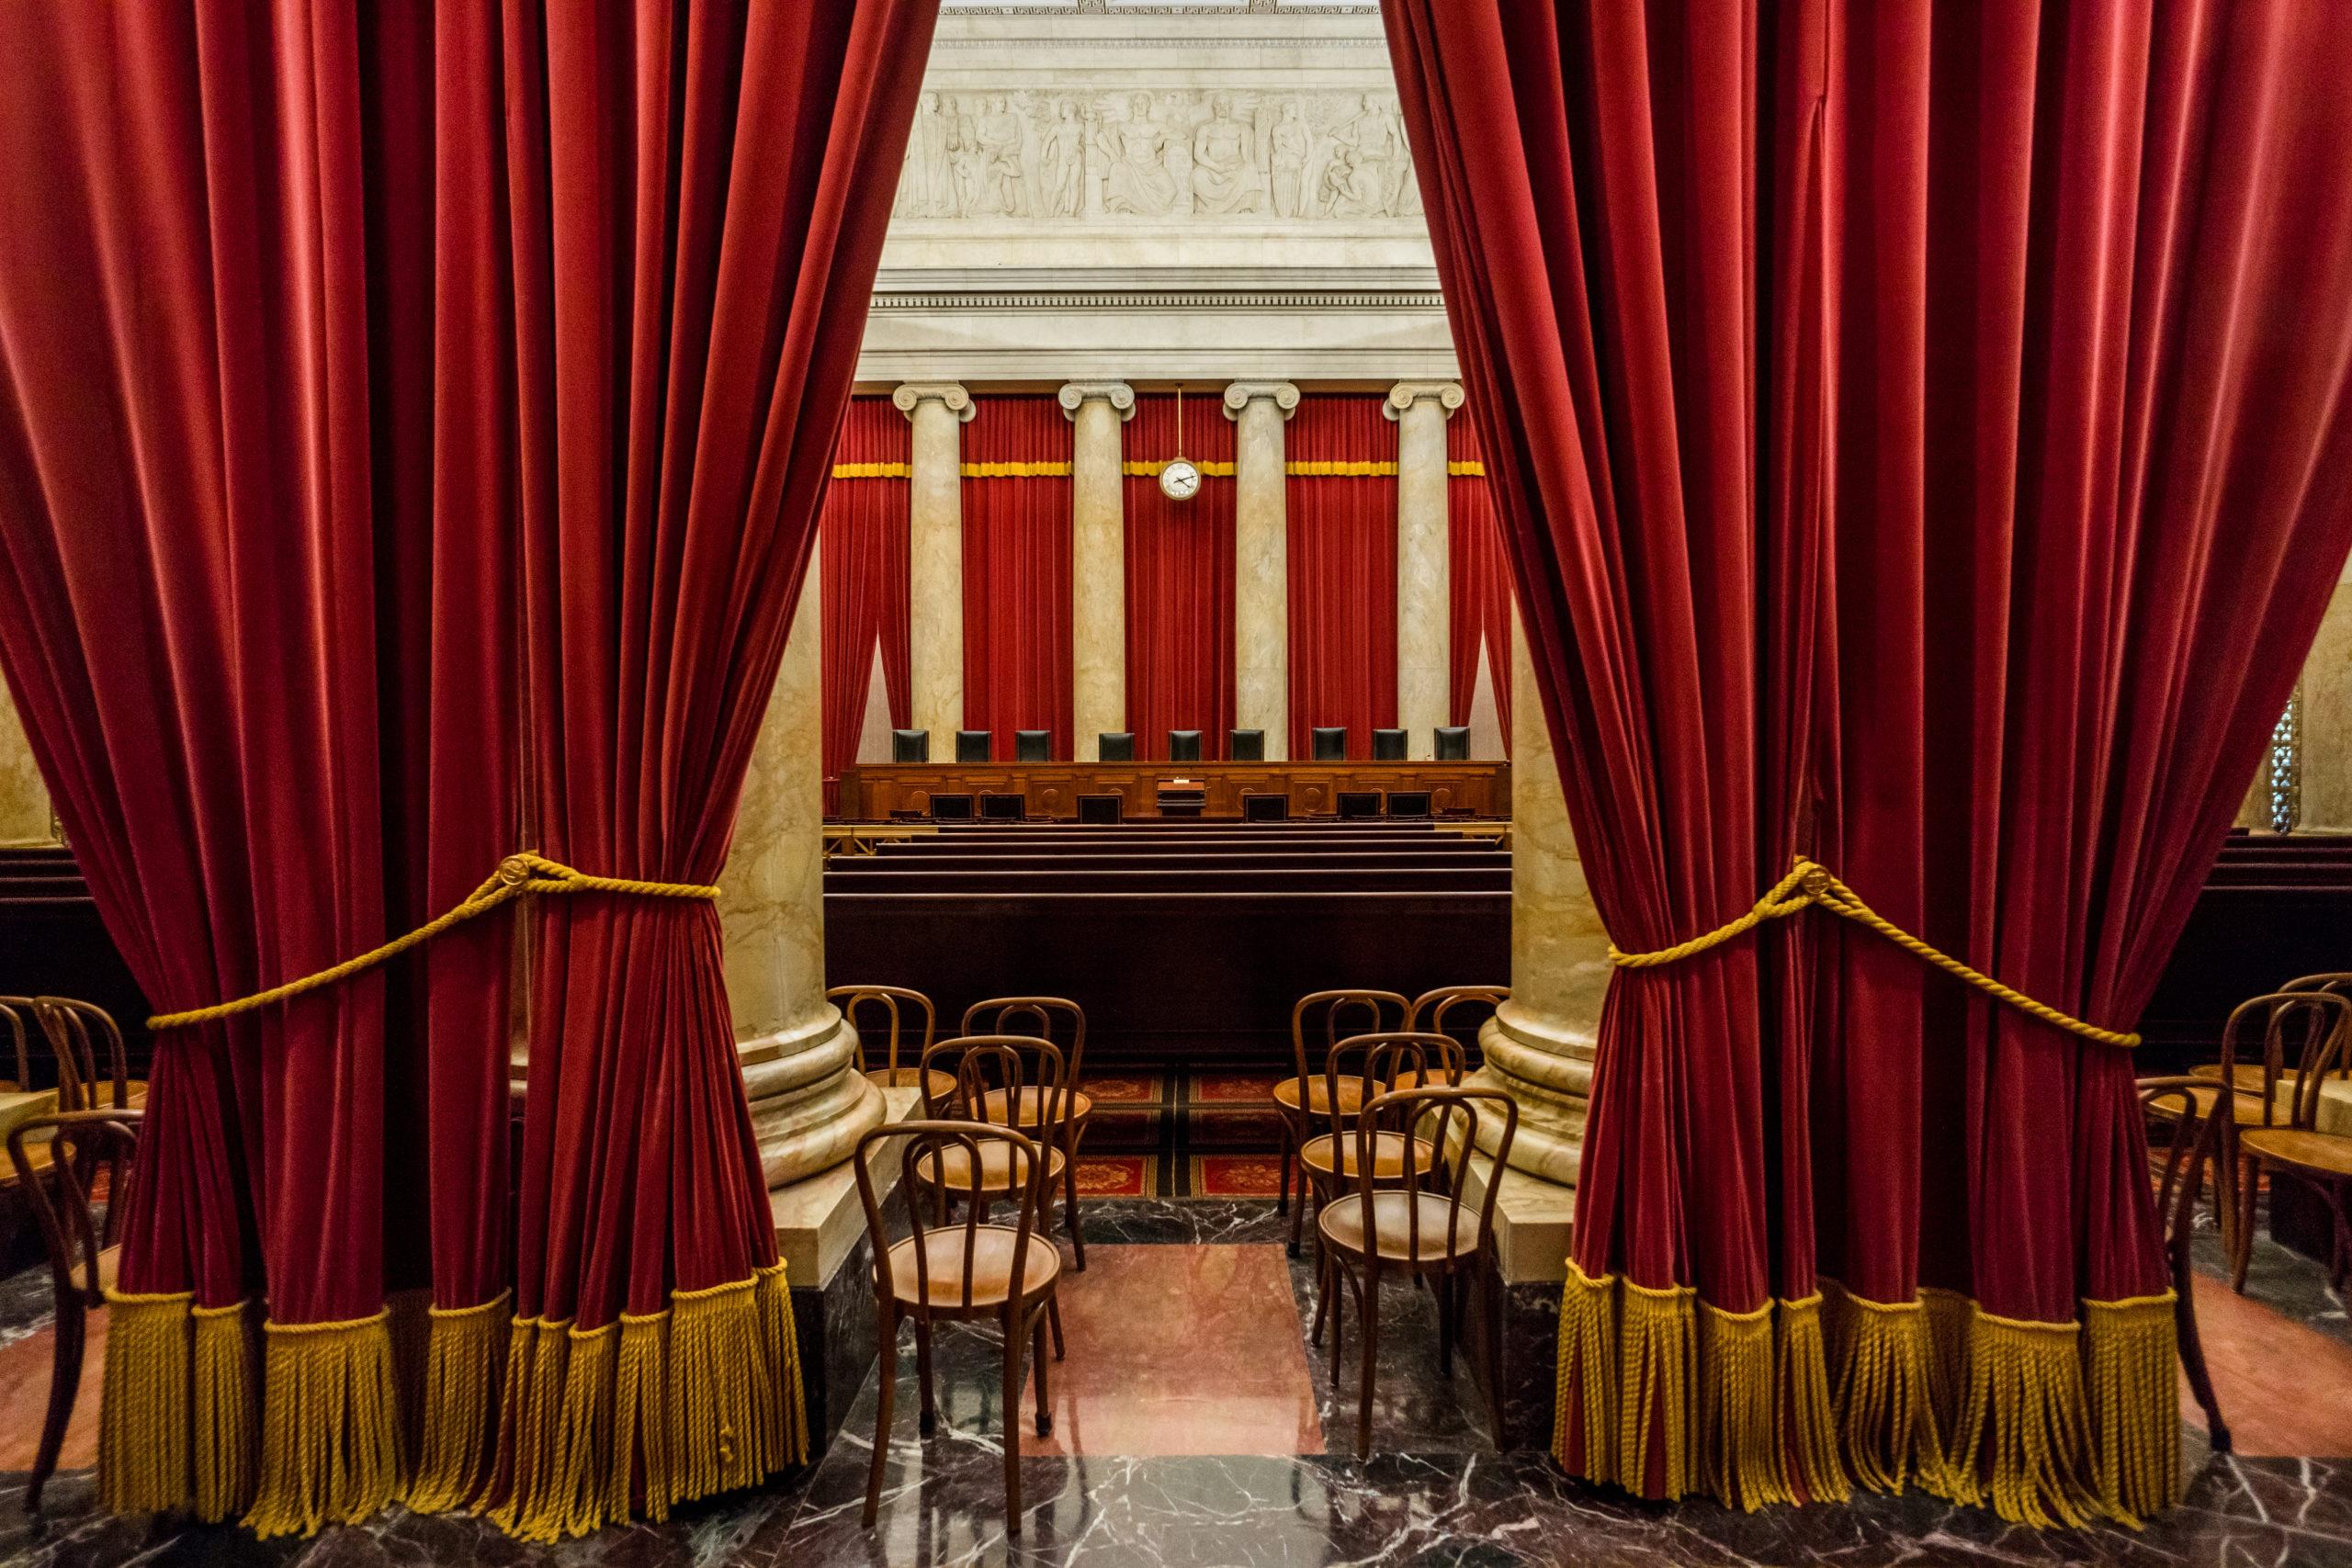 Supreme Court, Washington D.C.. [Shutterstock/stock_photo_world]